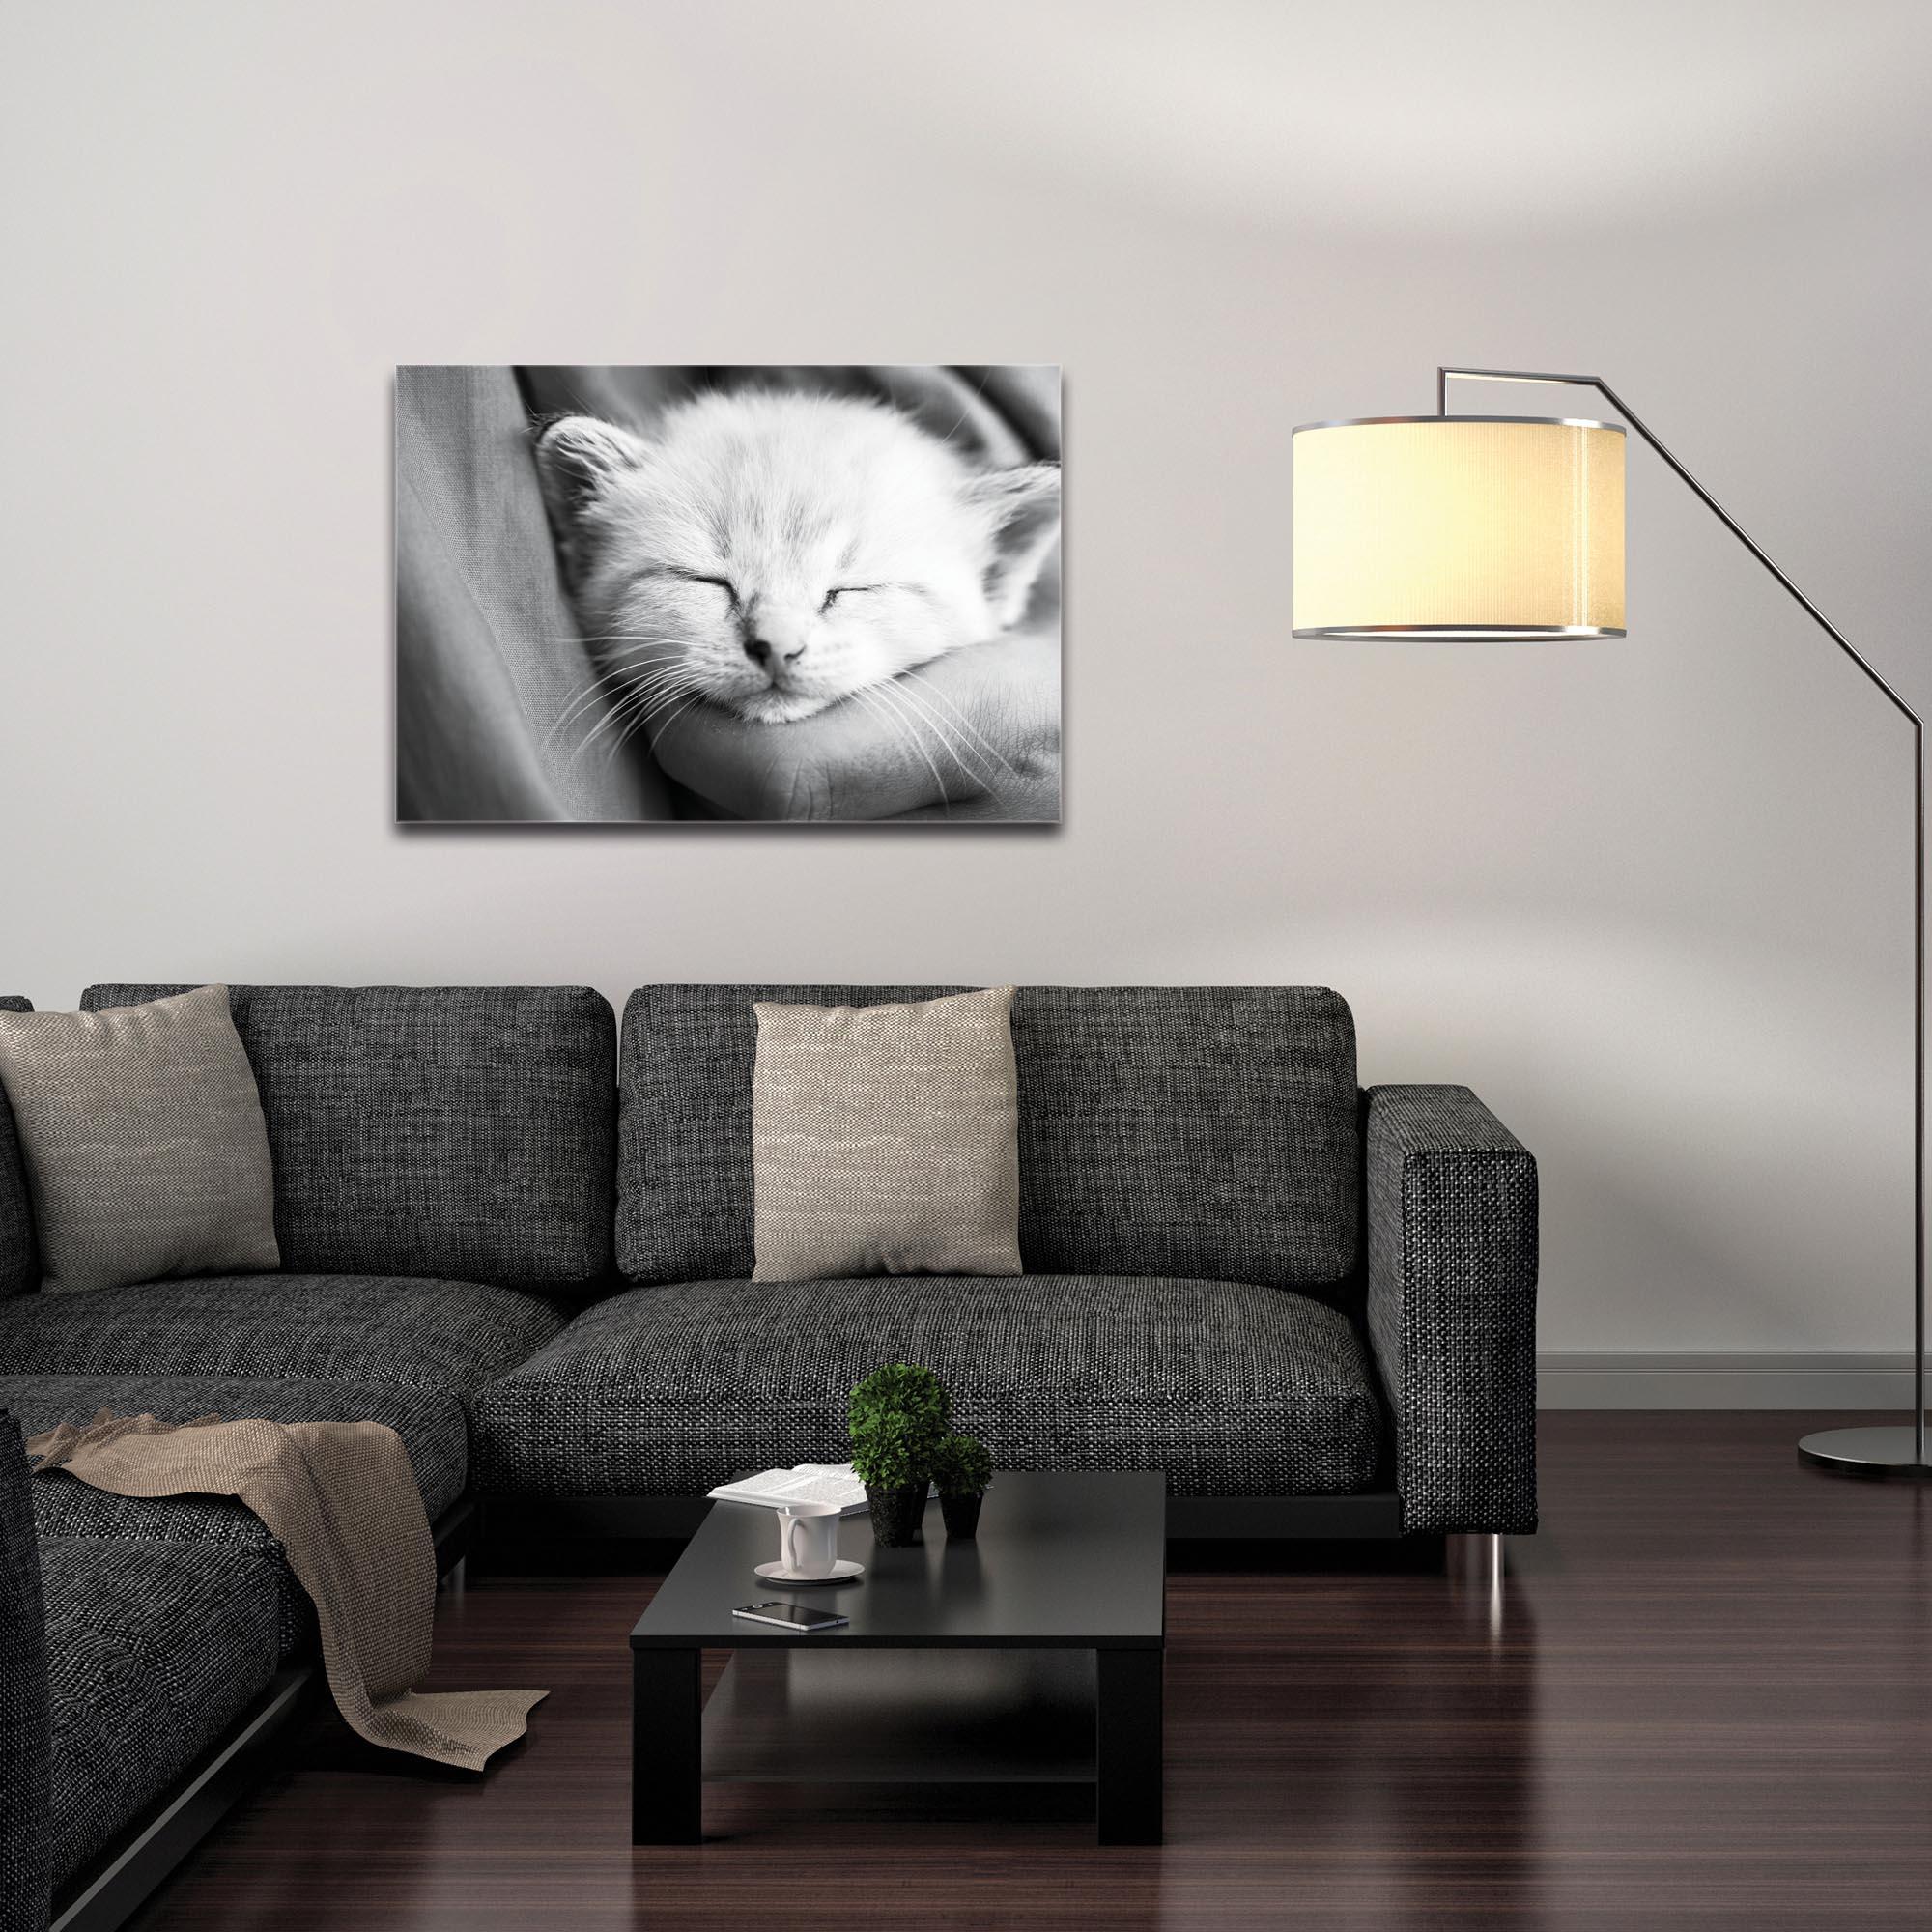 Casual Wall Art 'Kitten Dreams' - Wildlife Decor on Metal or Plexiglass - Image 3